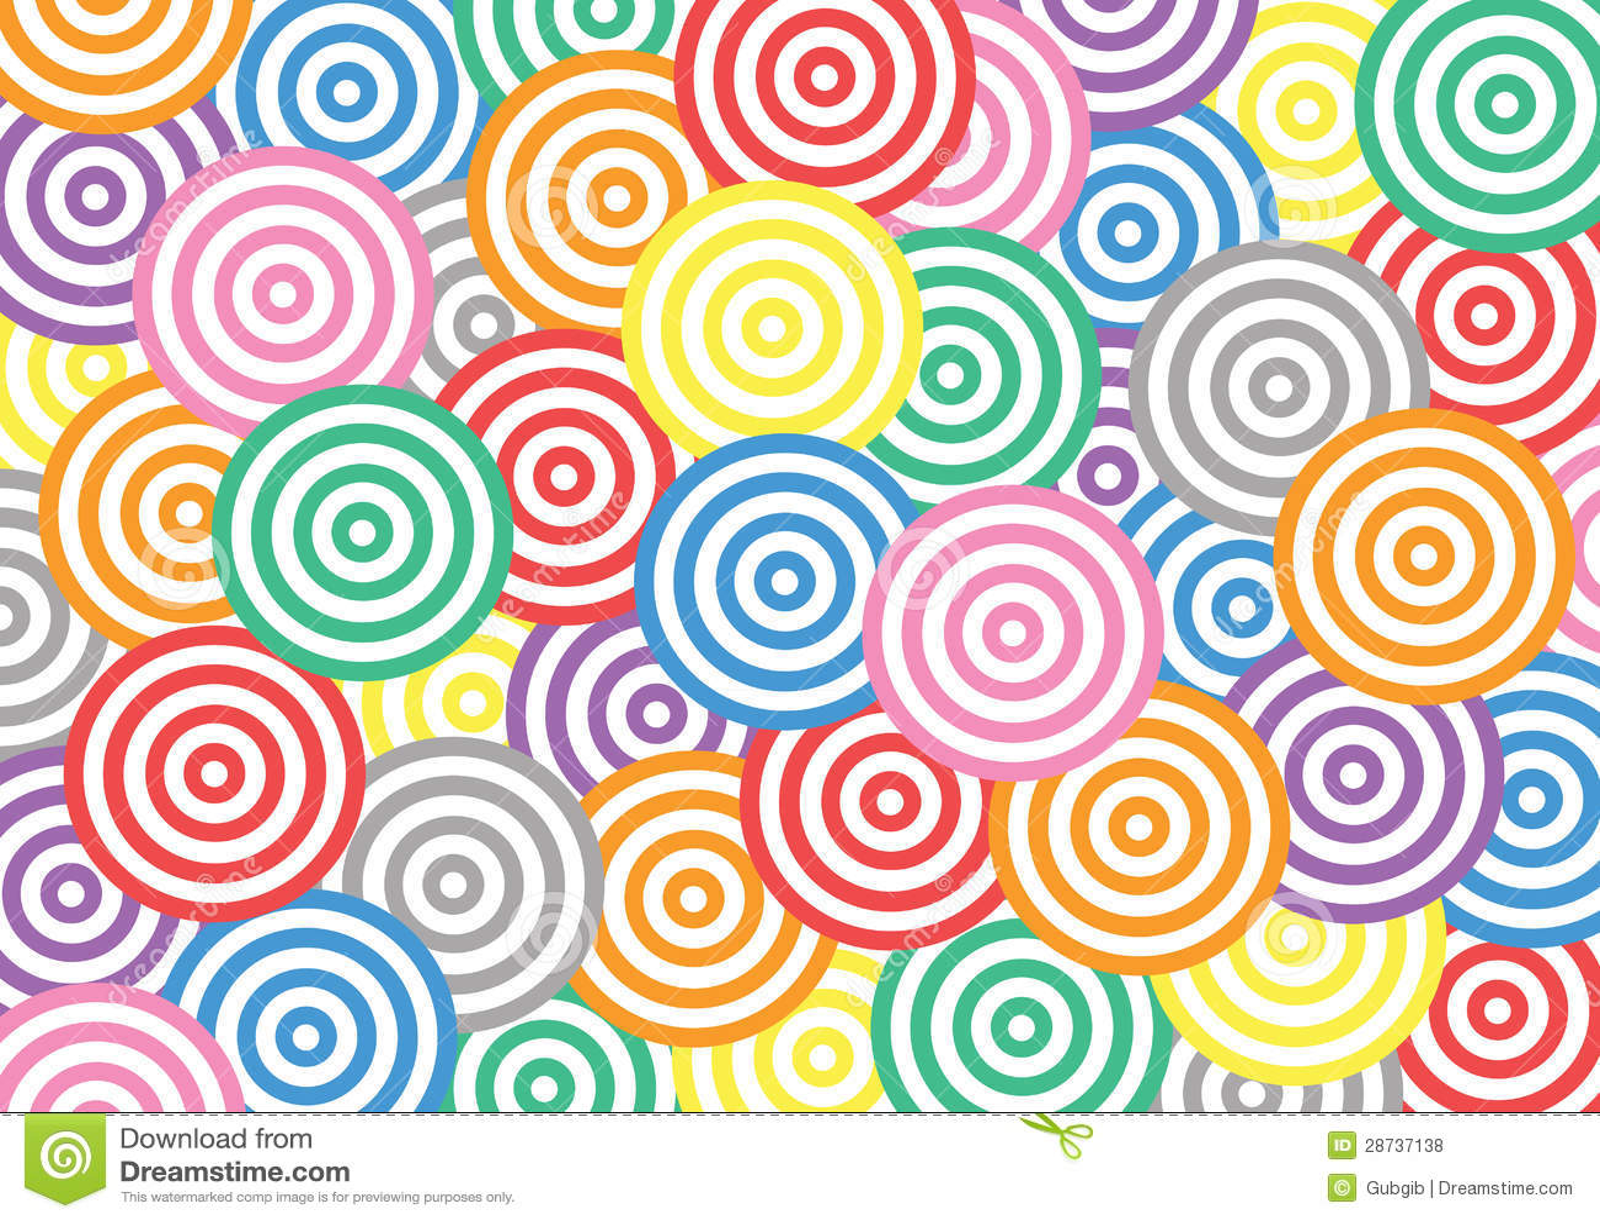 Colorful Circle Pattern Royalty Free Stock Photos - Image: 28737138